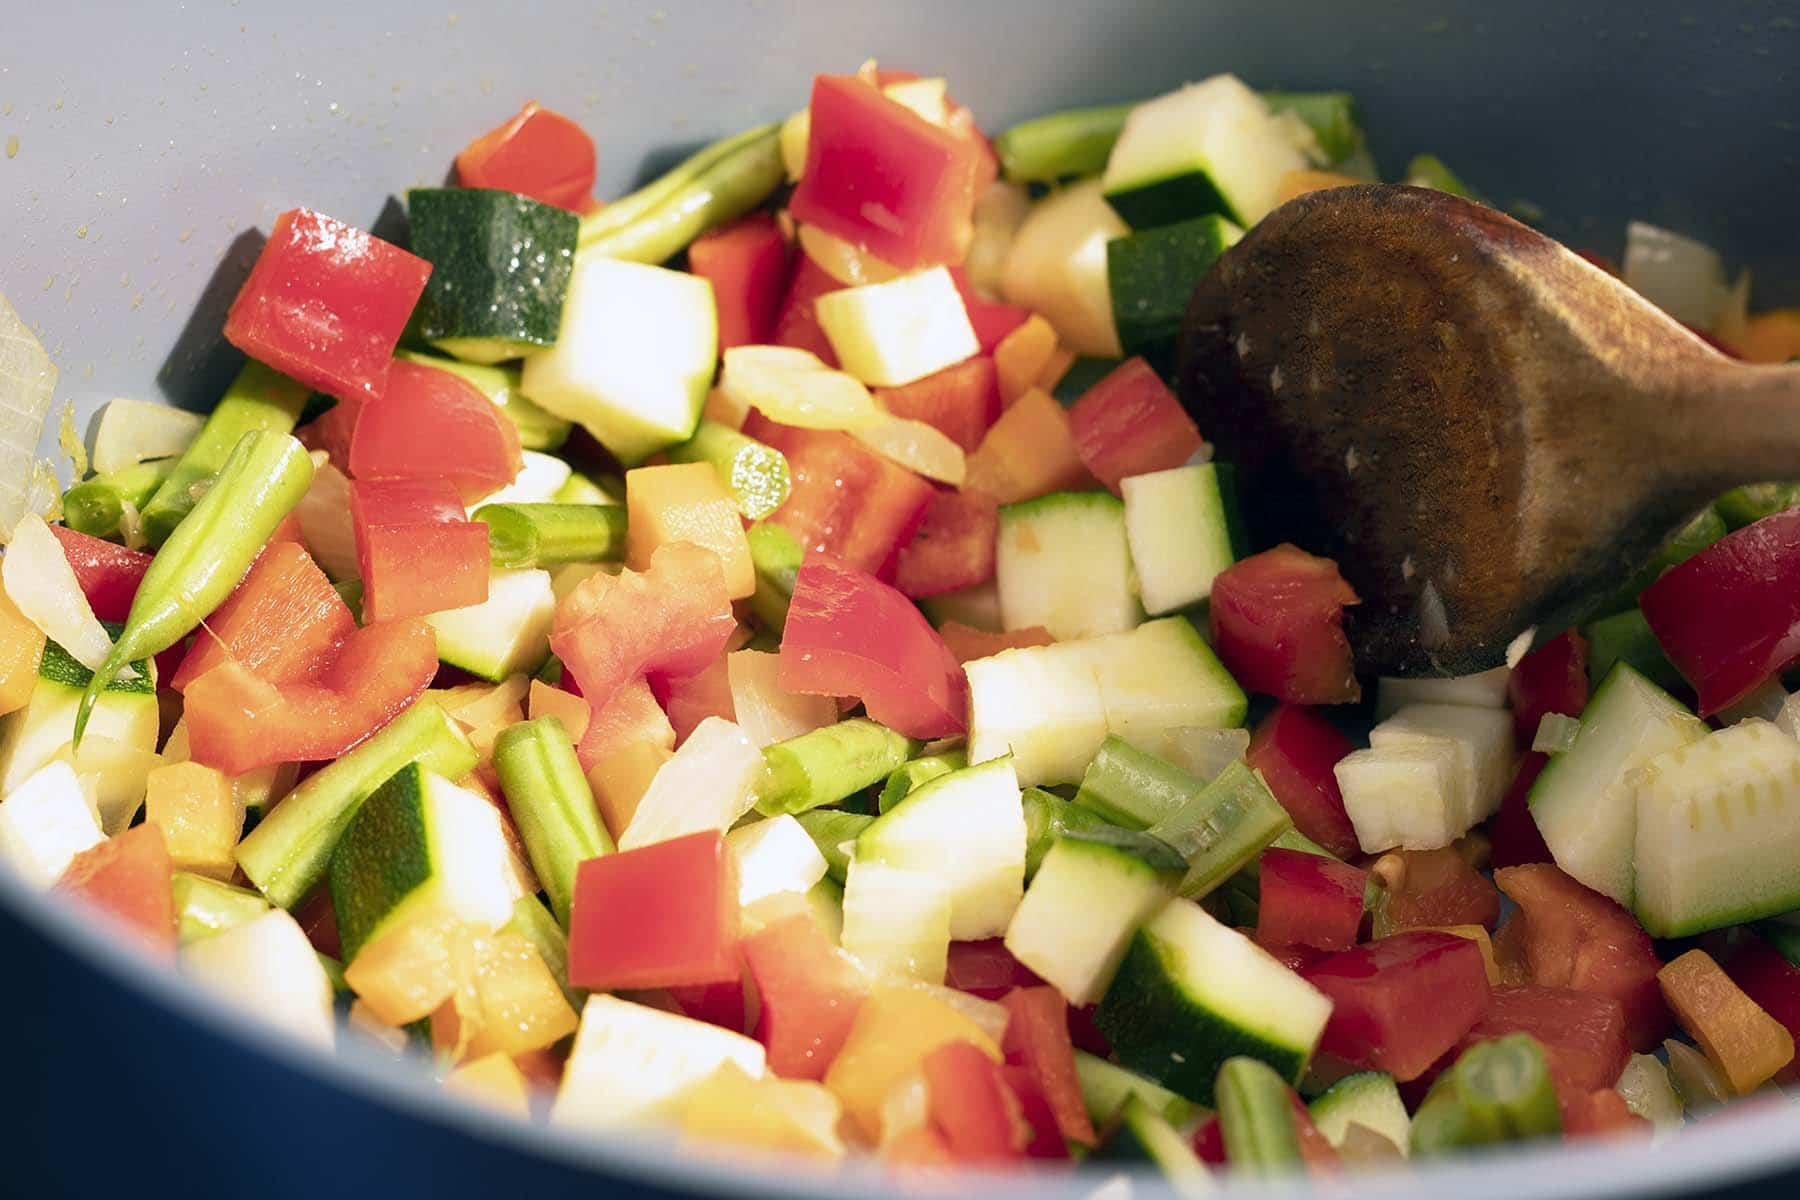 vegetables cooking in pot